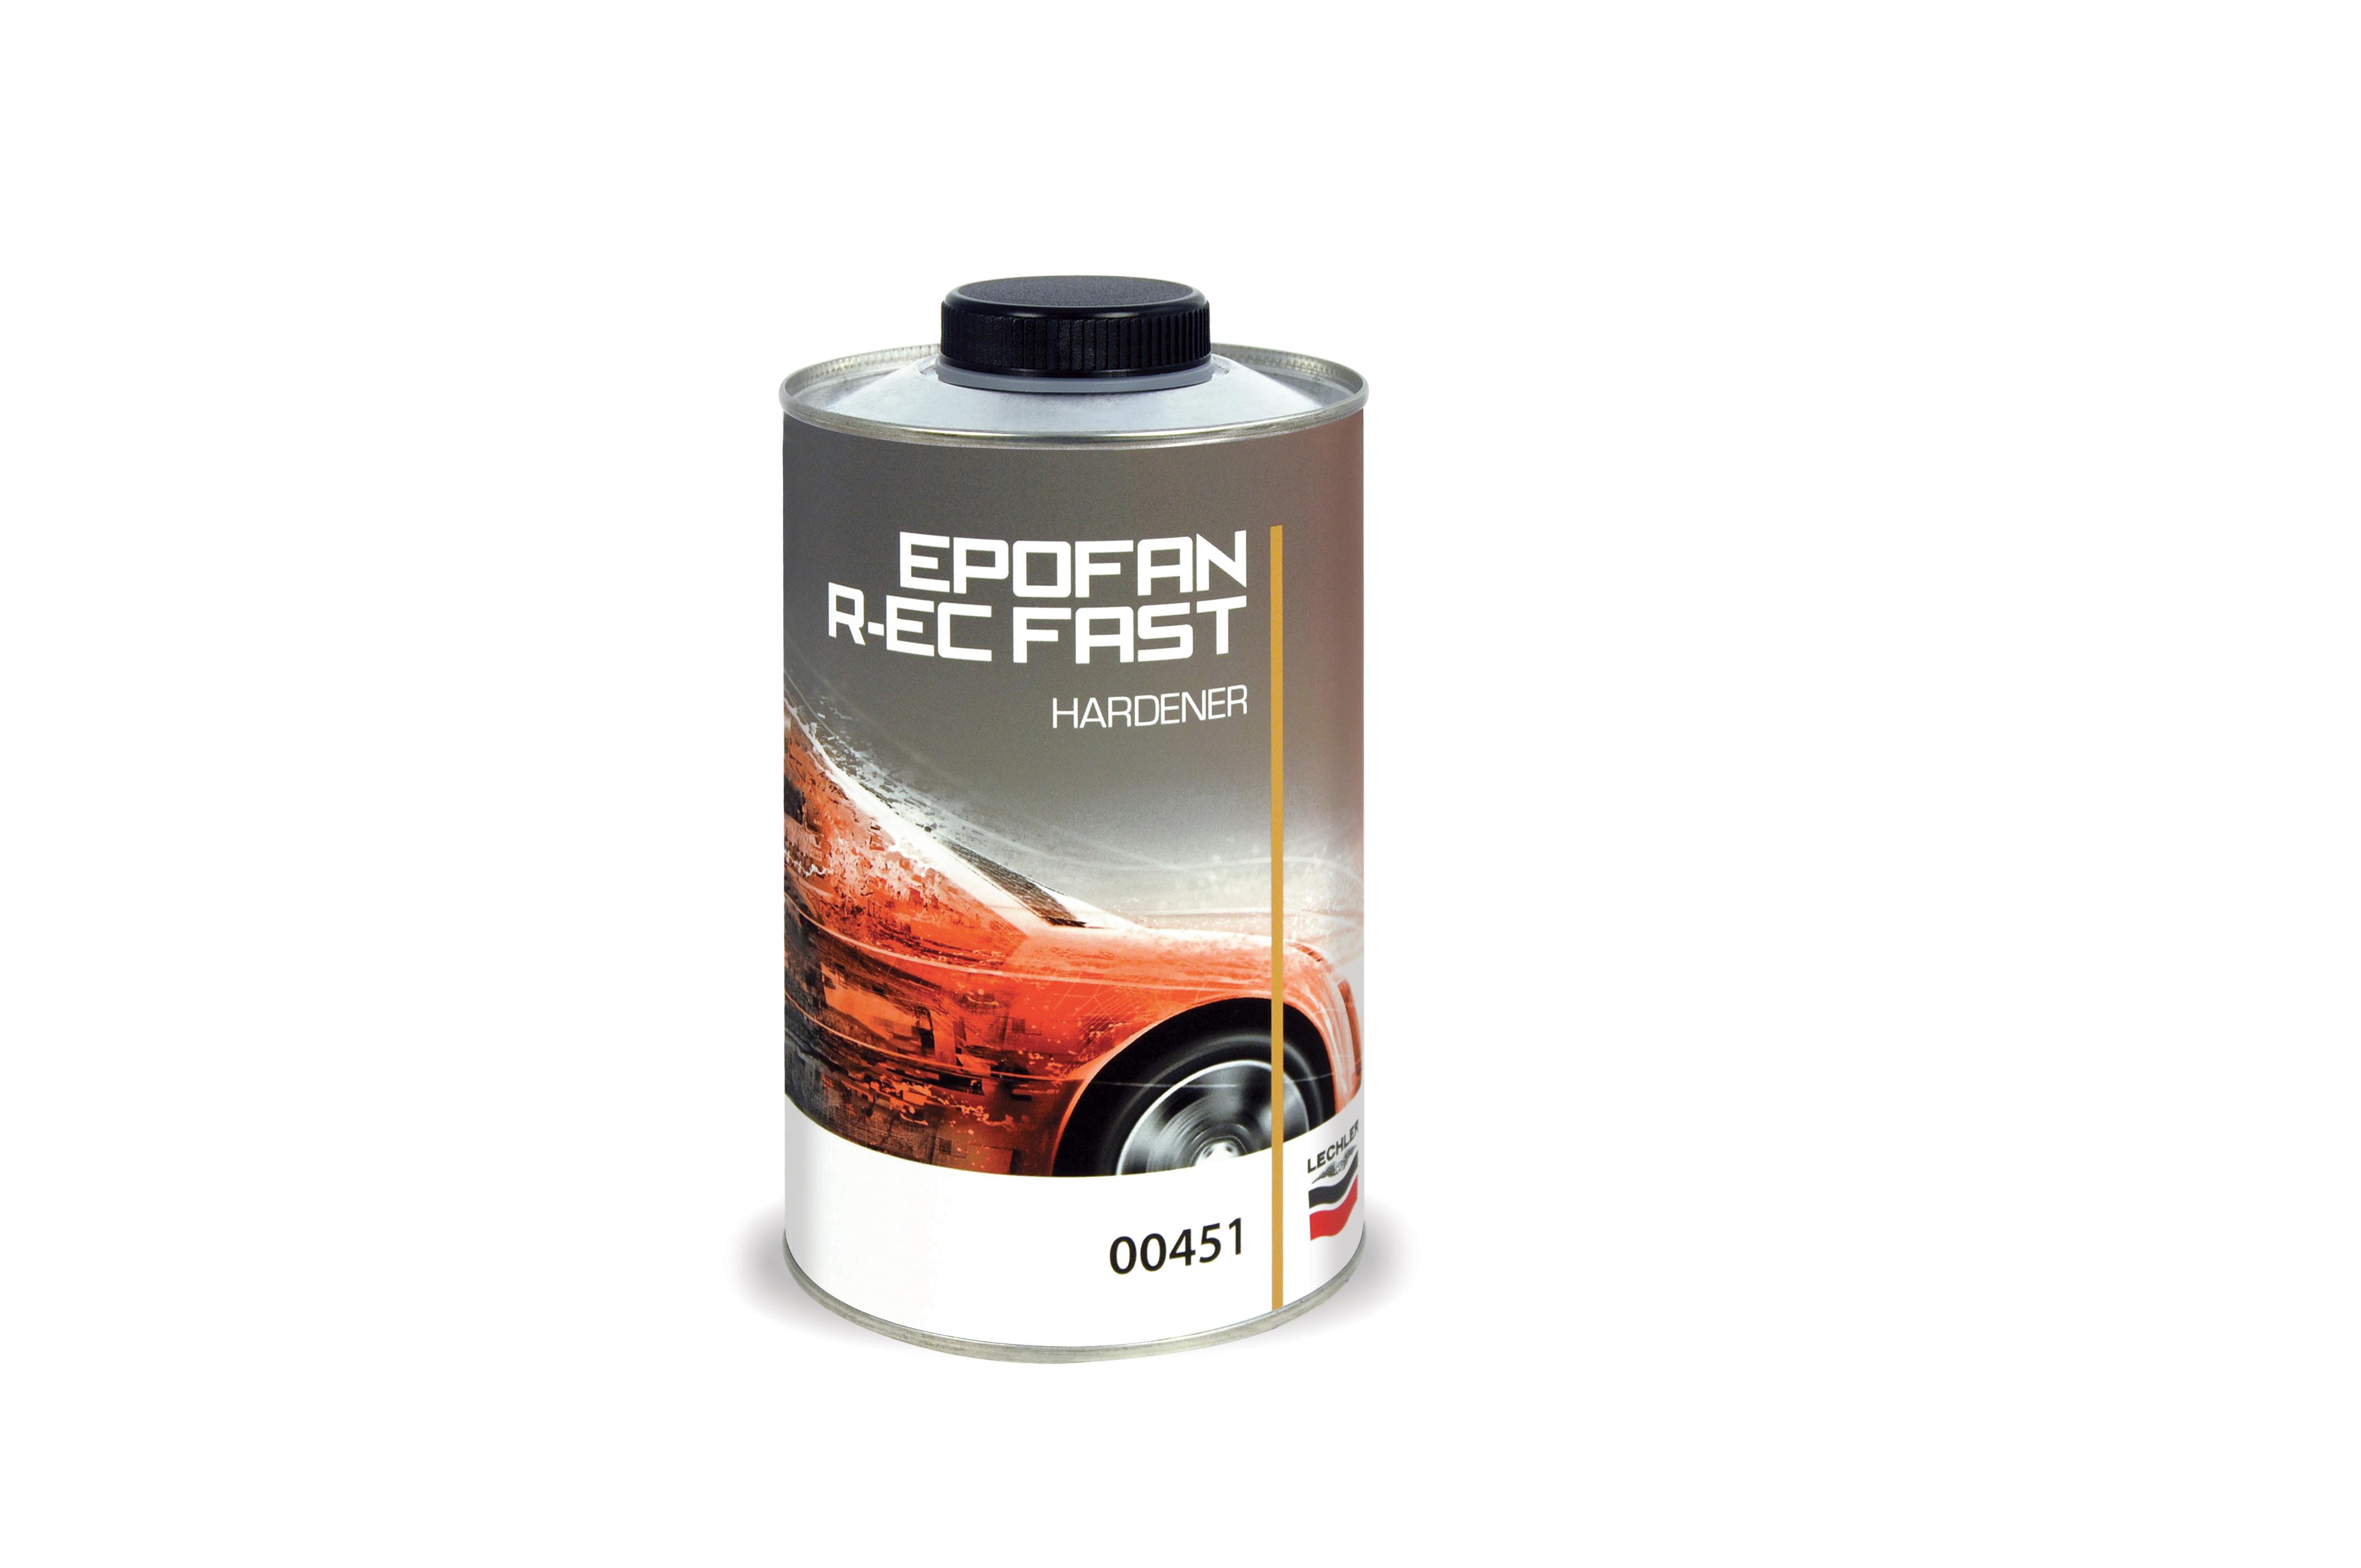 00451 Endurecedor Epofan R-EC